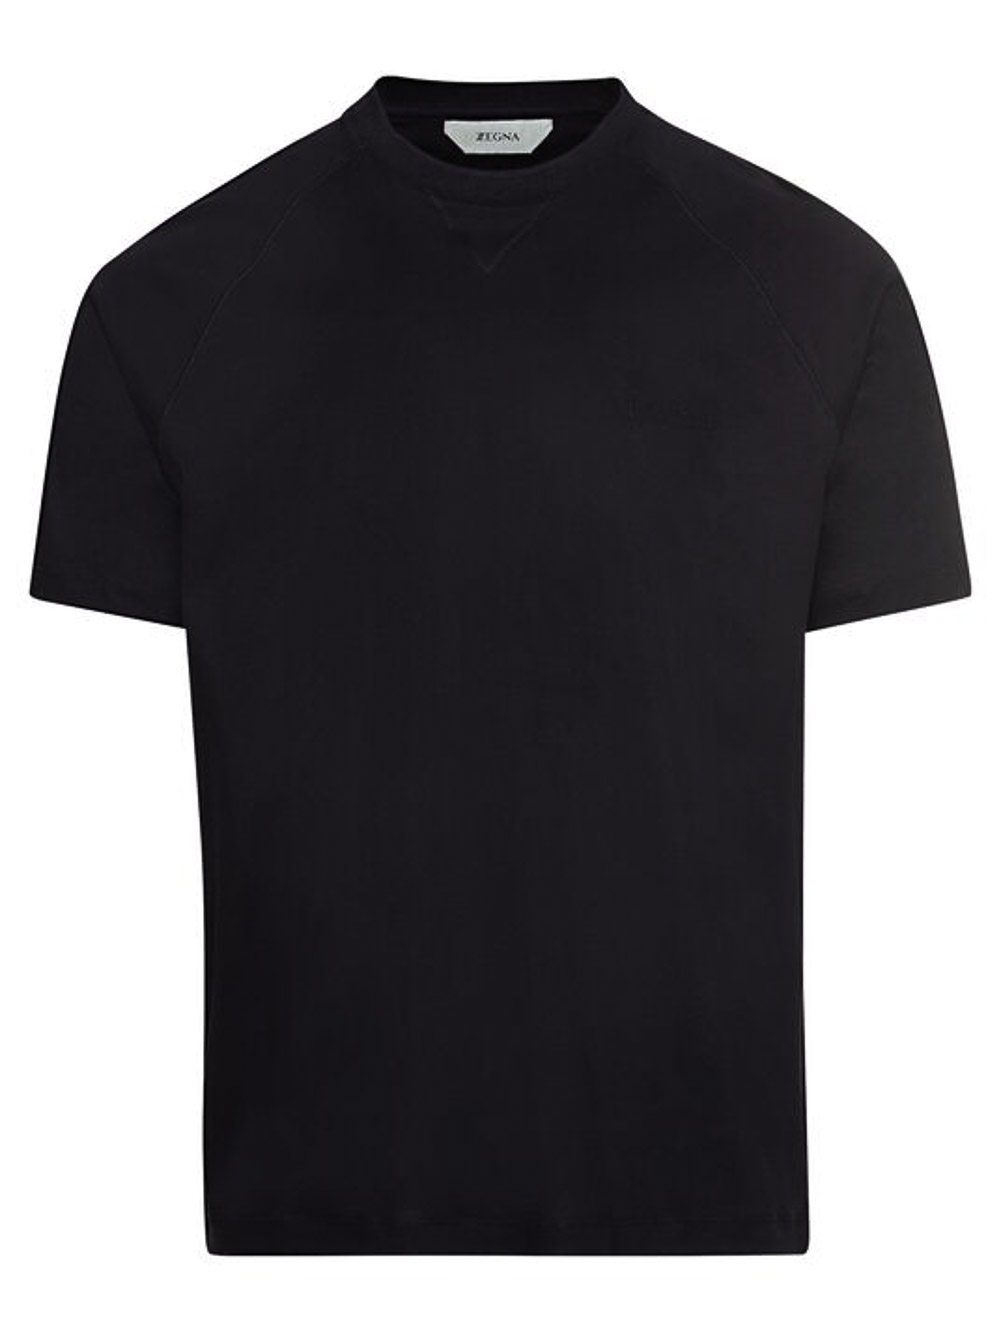 ZEGNA Μπλούζα Τ-shirt VW348 ZZ638-B09 ΜΠΛΕ